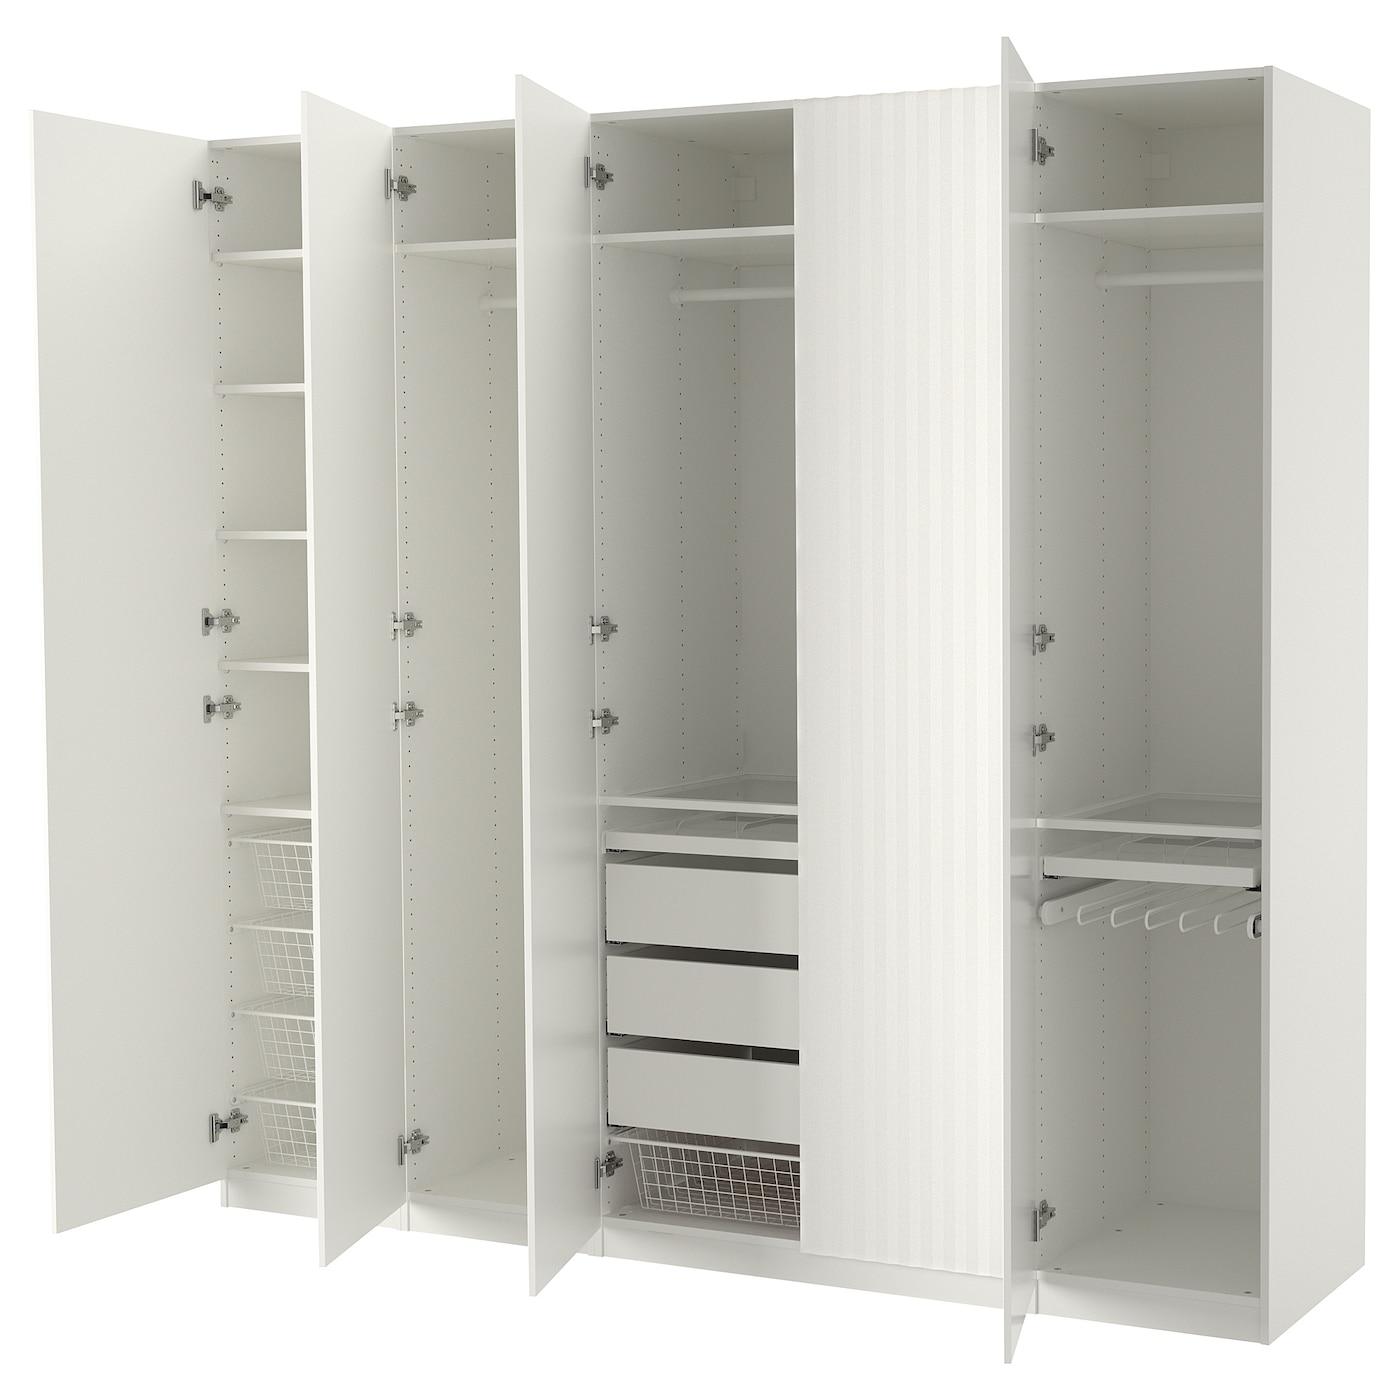 Armarios pax a medida compra online ikea for Ikea armarios a medida